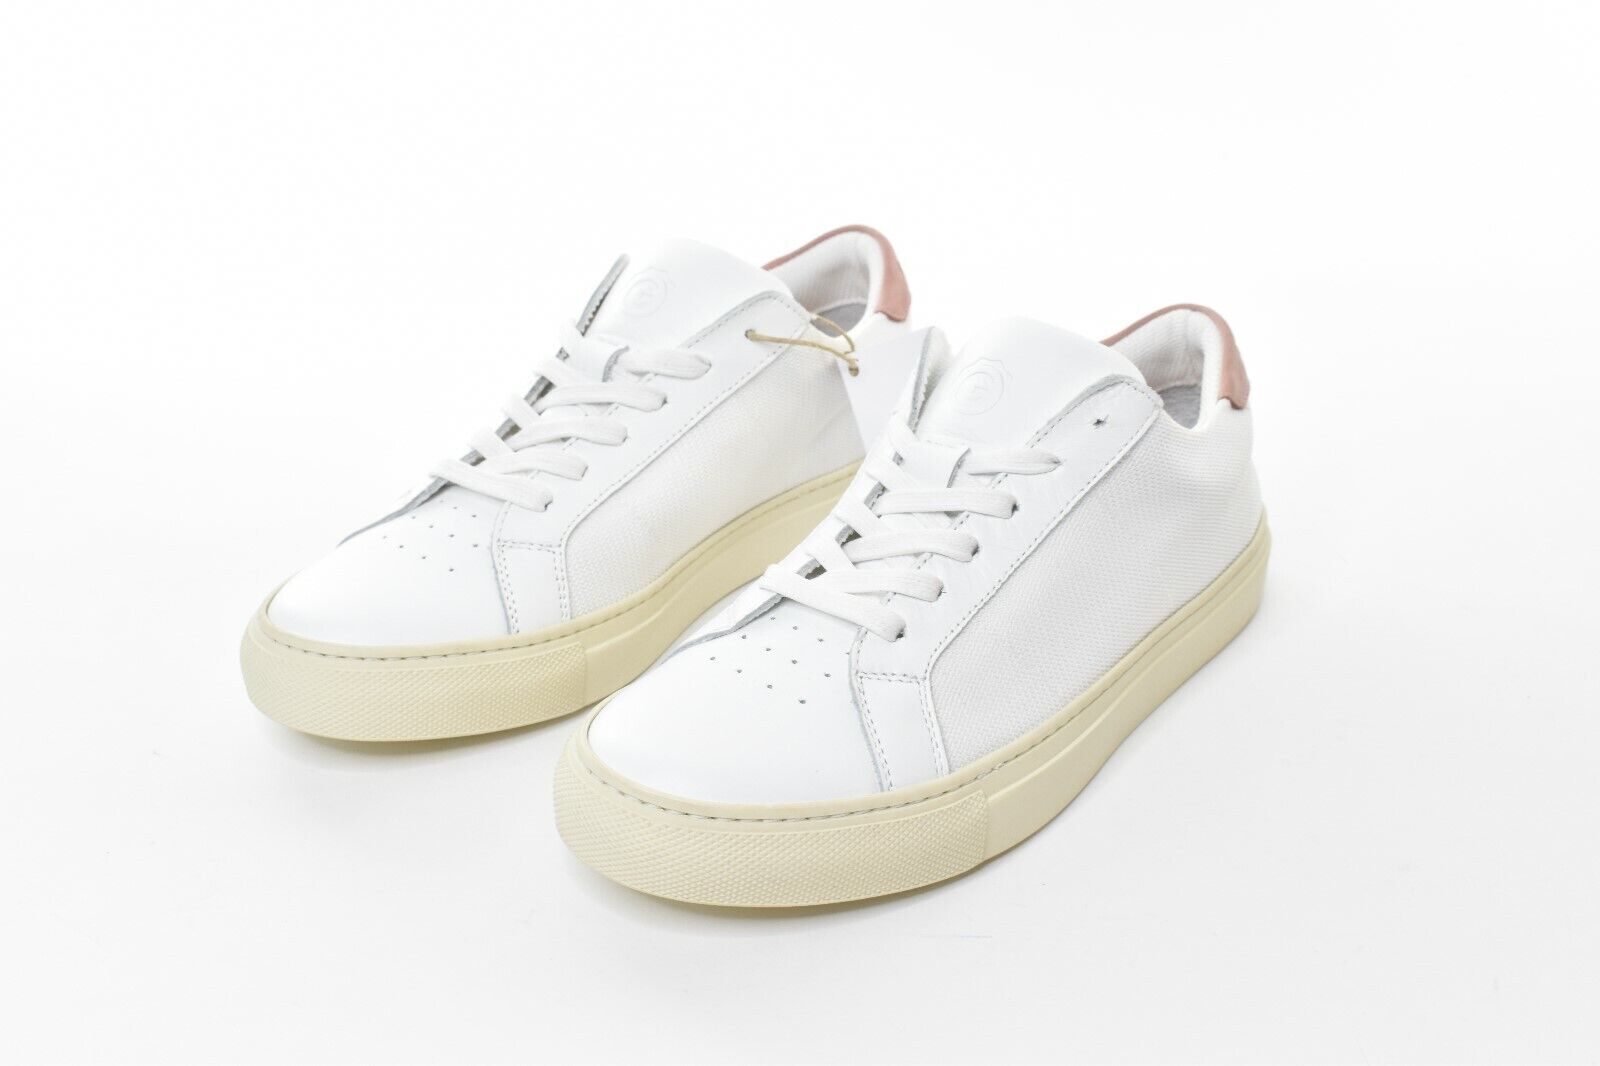 Greats The Royale Vintage Blaush damen 7.5 Schuhe Leder Neue weiße Turnschuhe